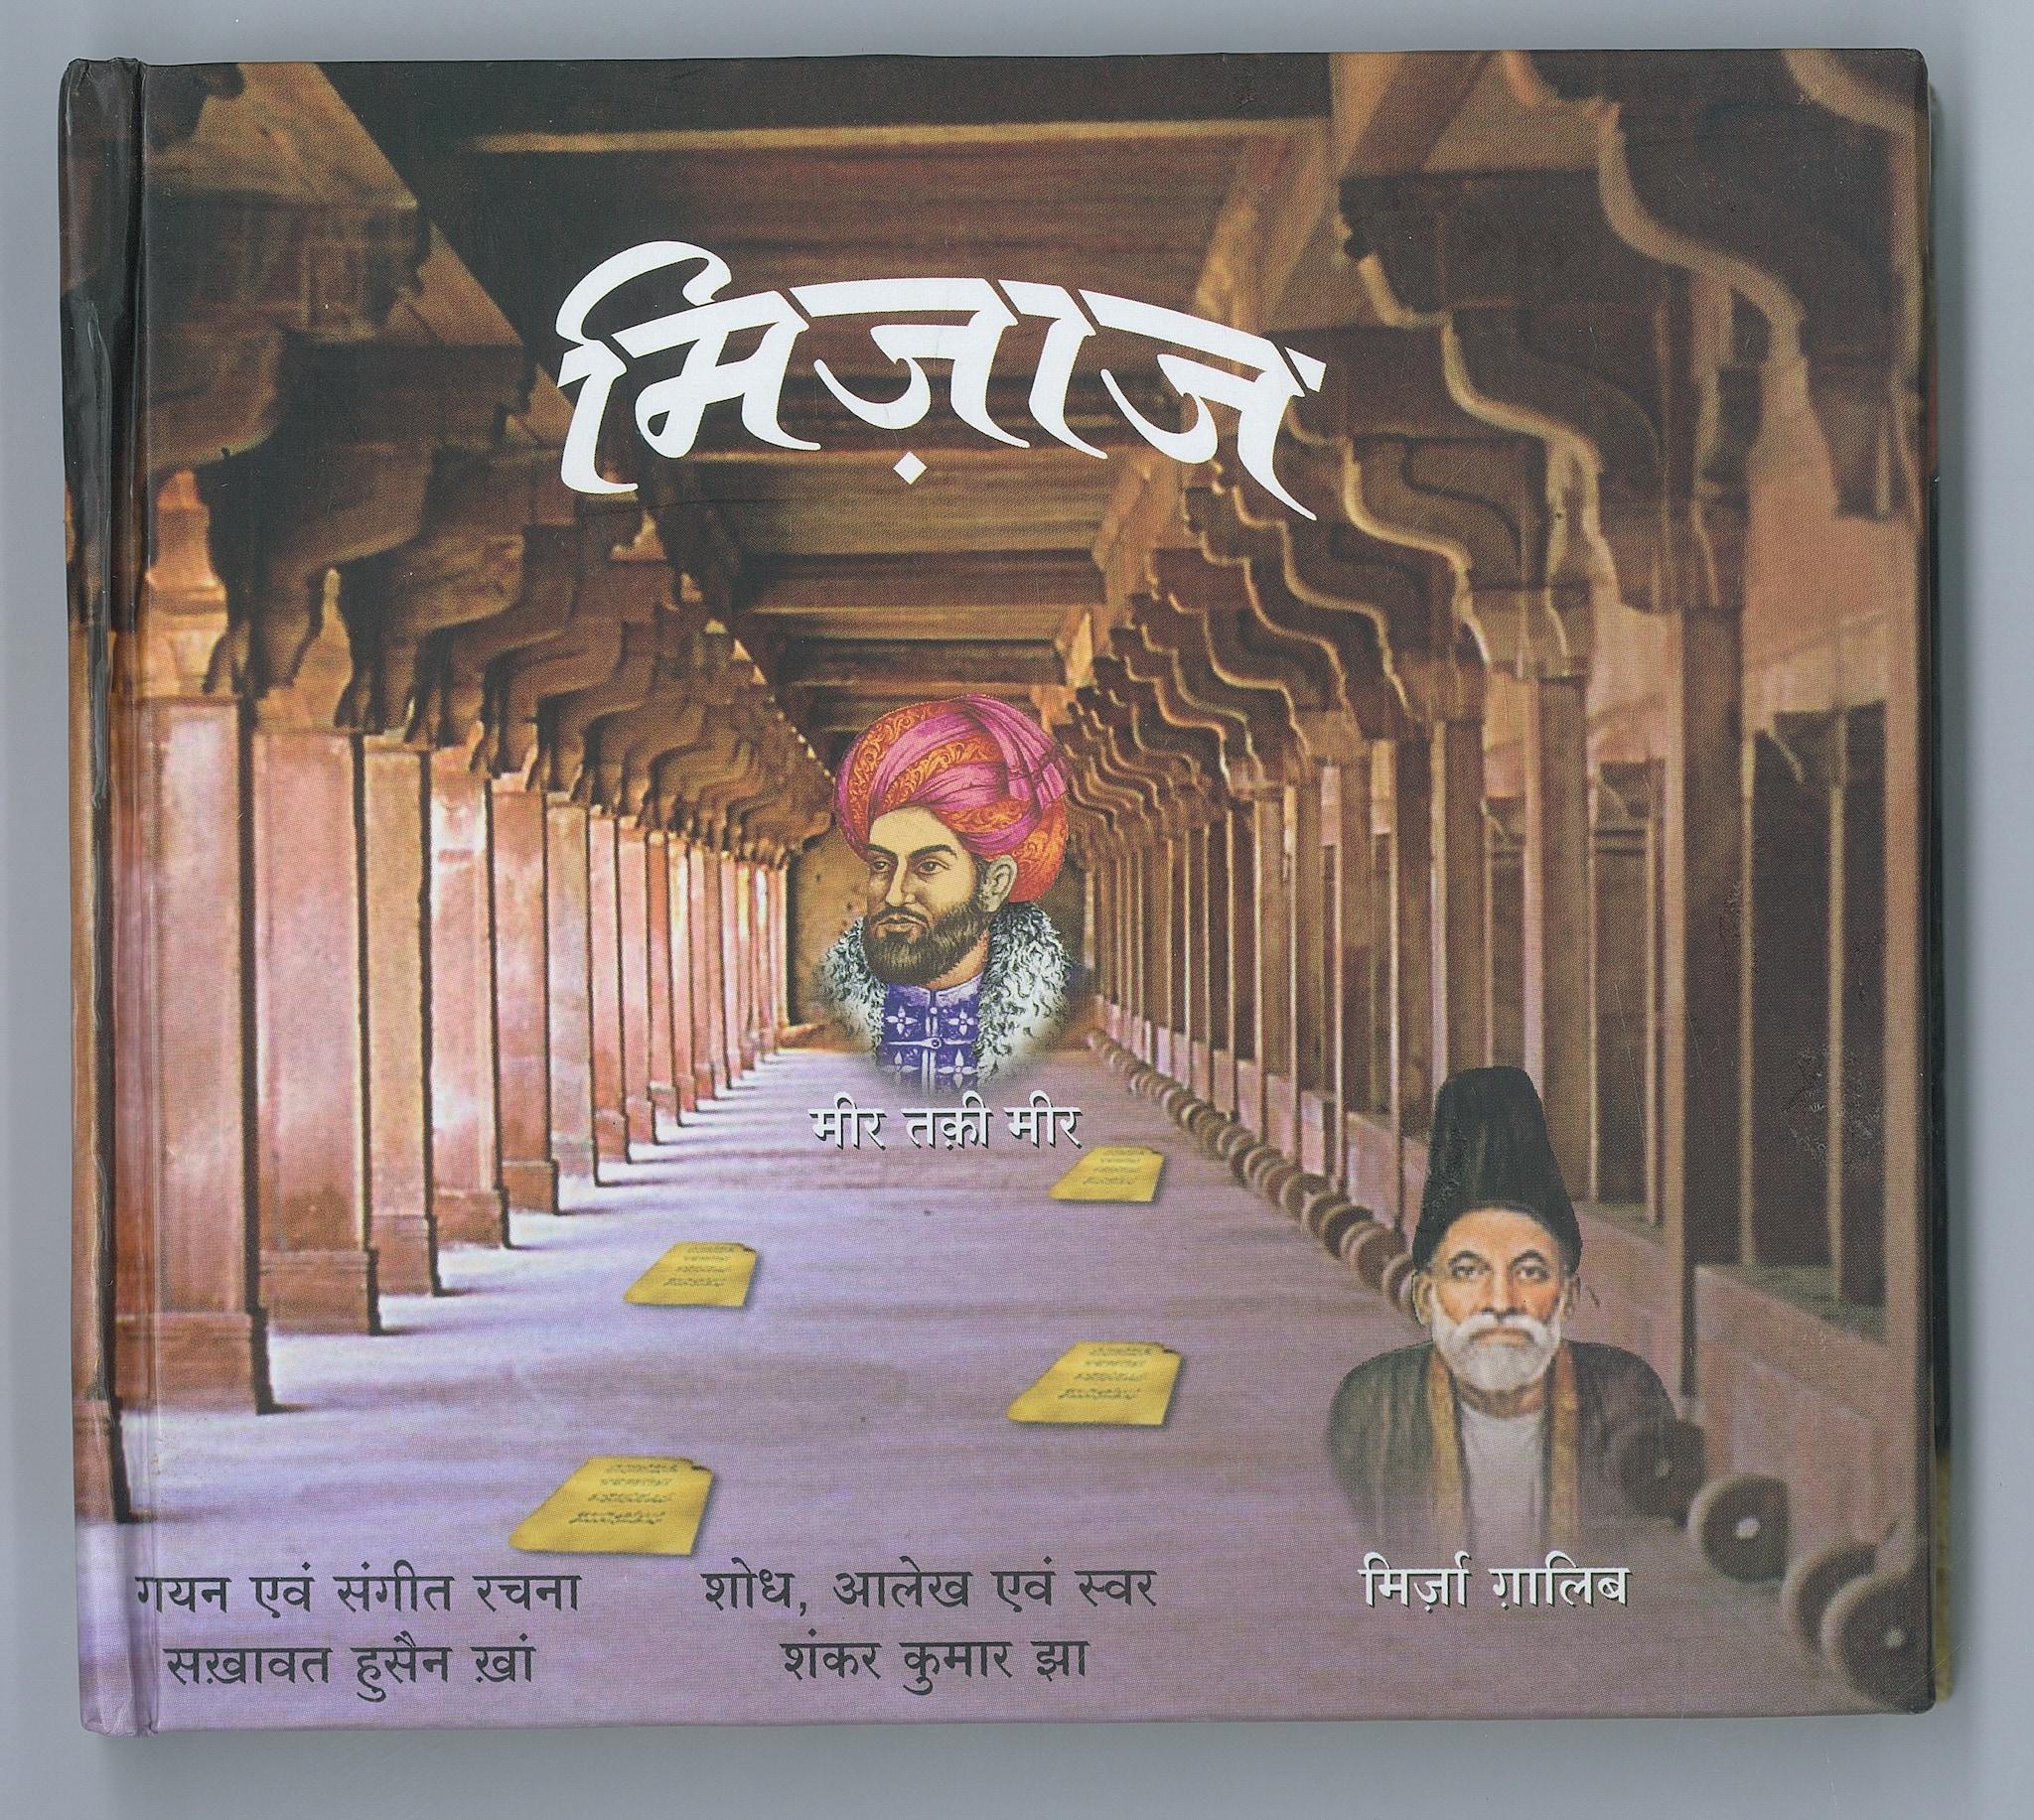 The CD on Urdu poets Mirza Ghalib and Mir Taqi Mir has been sung by Sakhawat Hussain Khan.